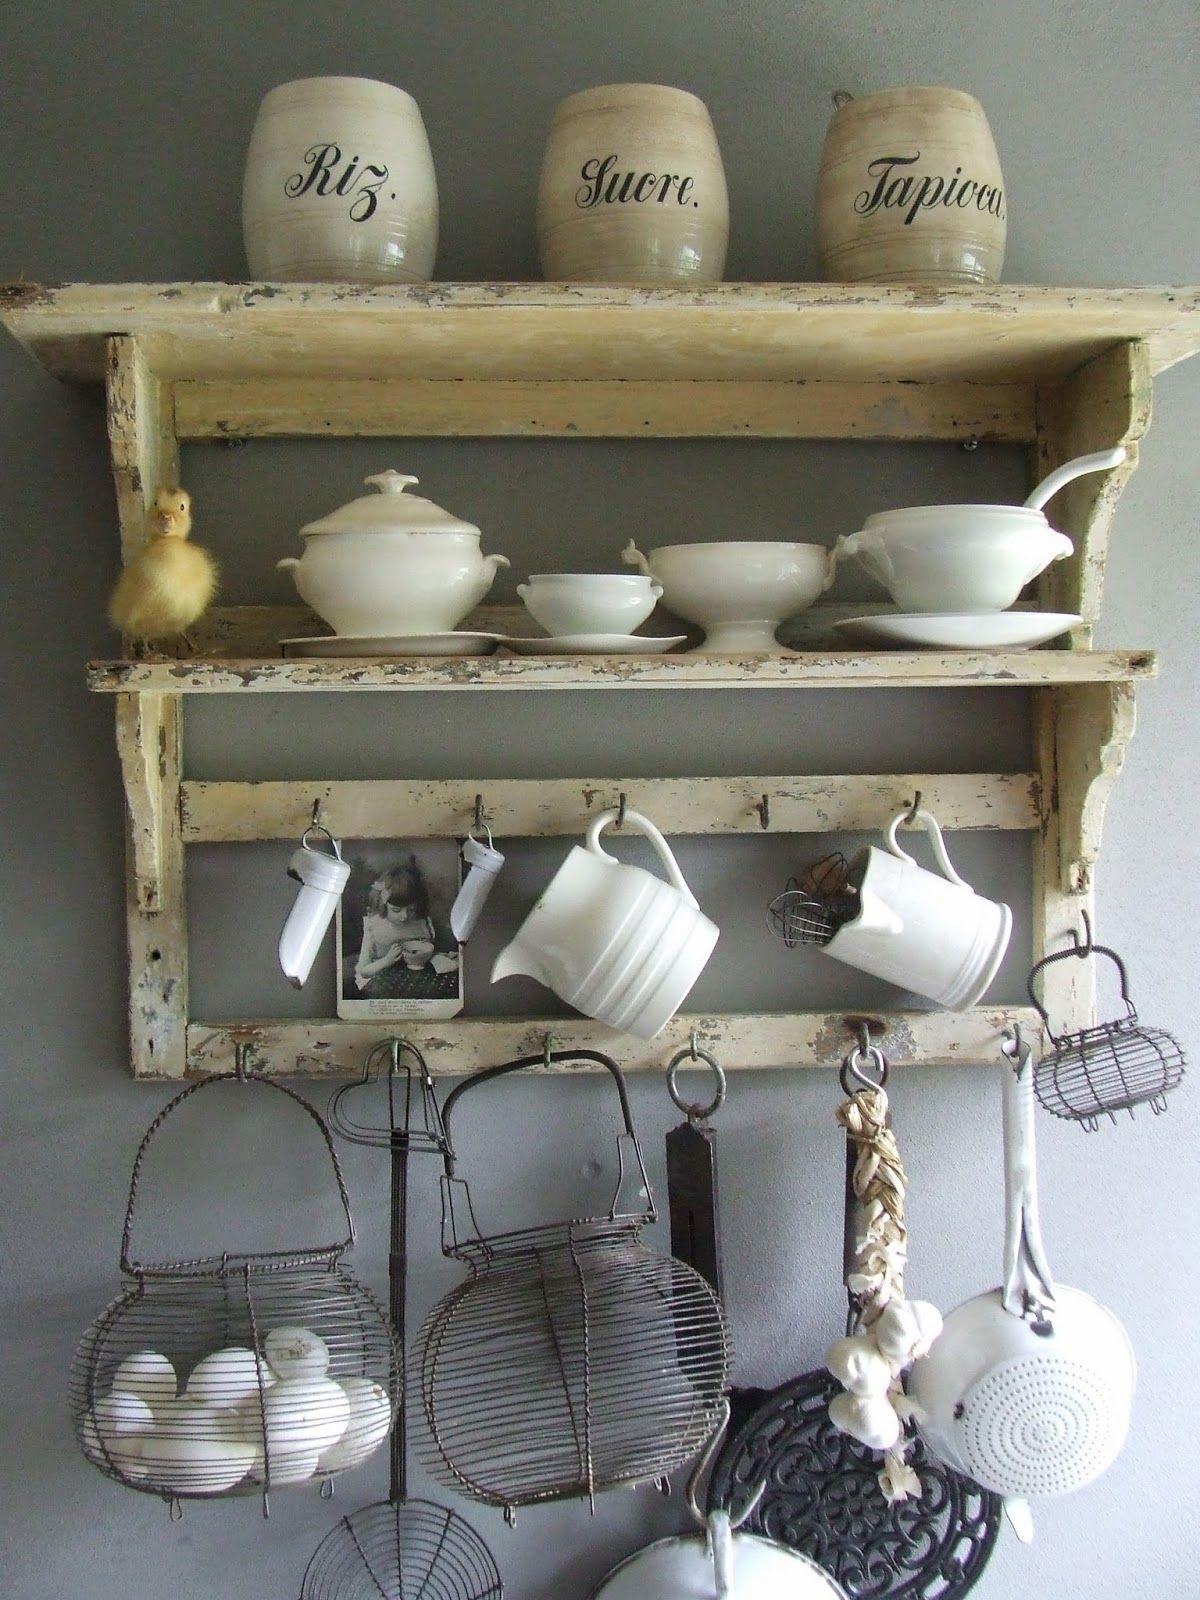 Mooi Keukenrek Regaal In Oude Stijl Vintage White In